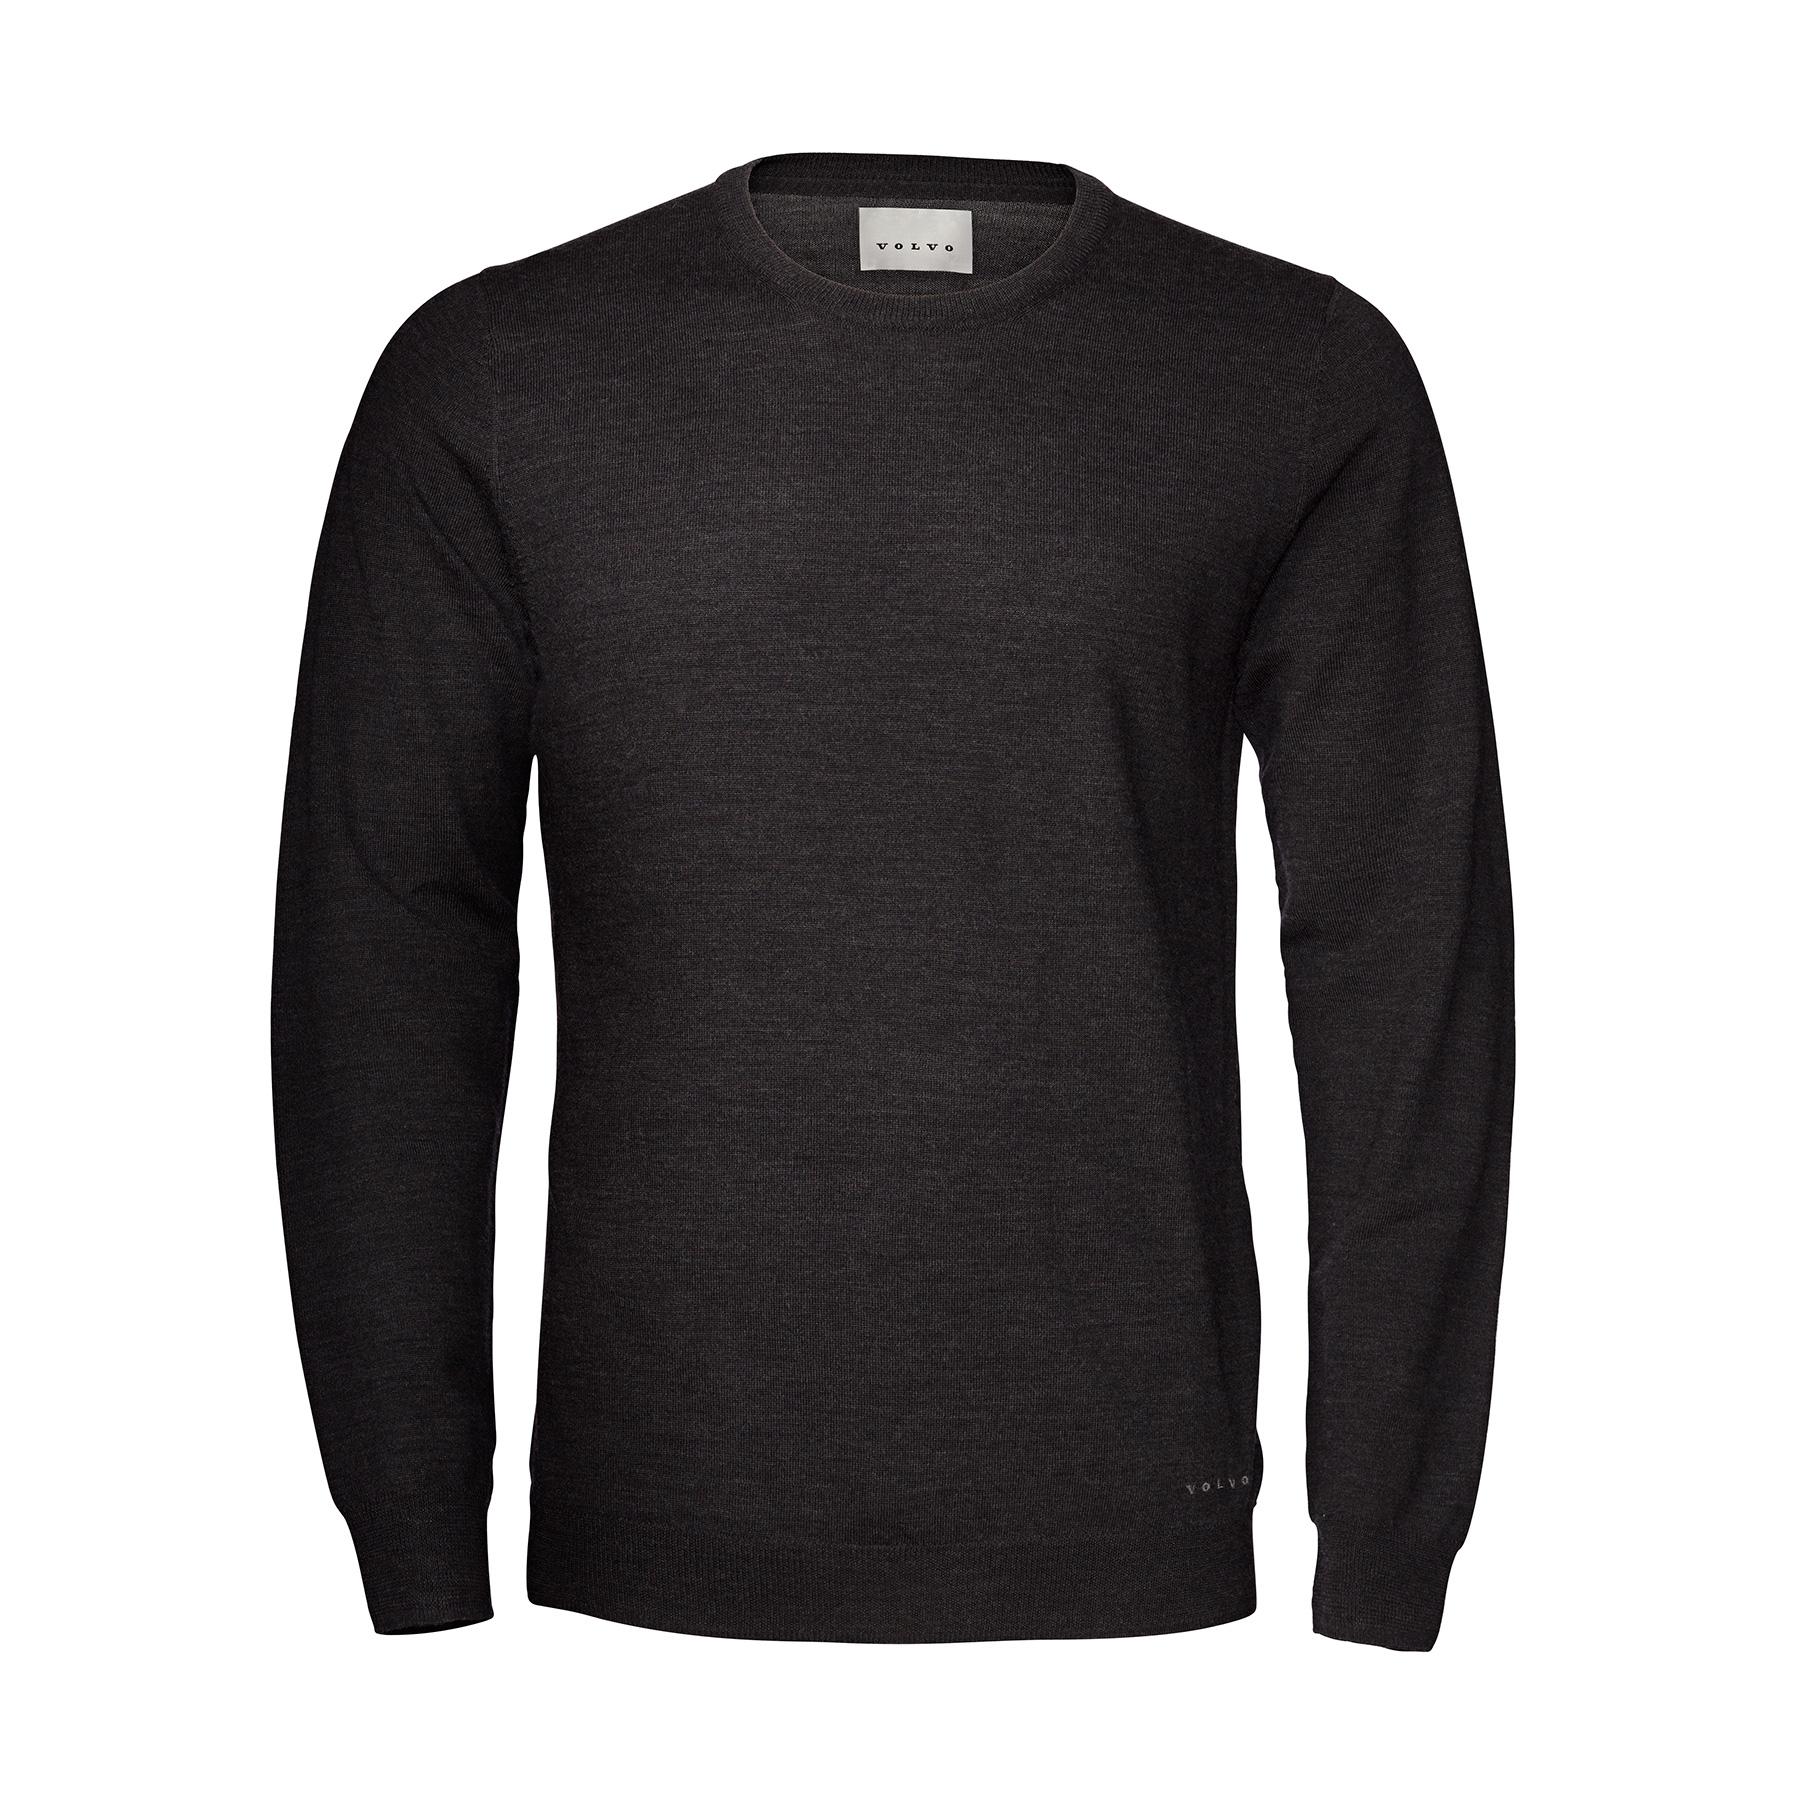 Volvo Car Lifestyle Collection Shop Nordic Merino Sweater